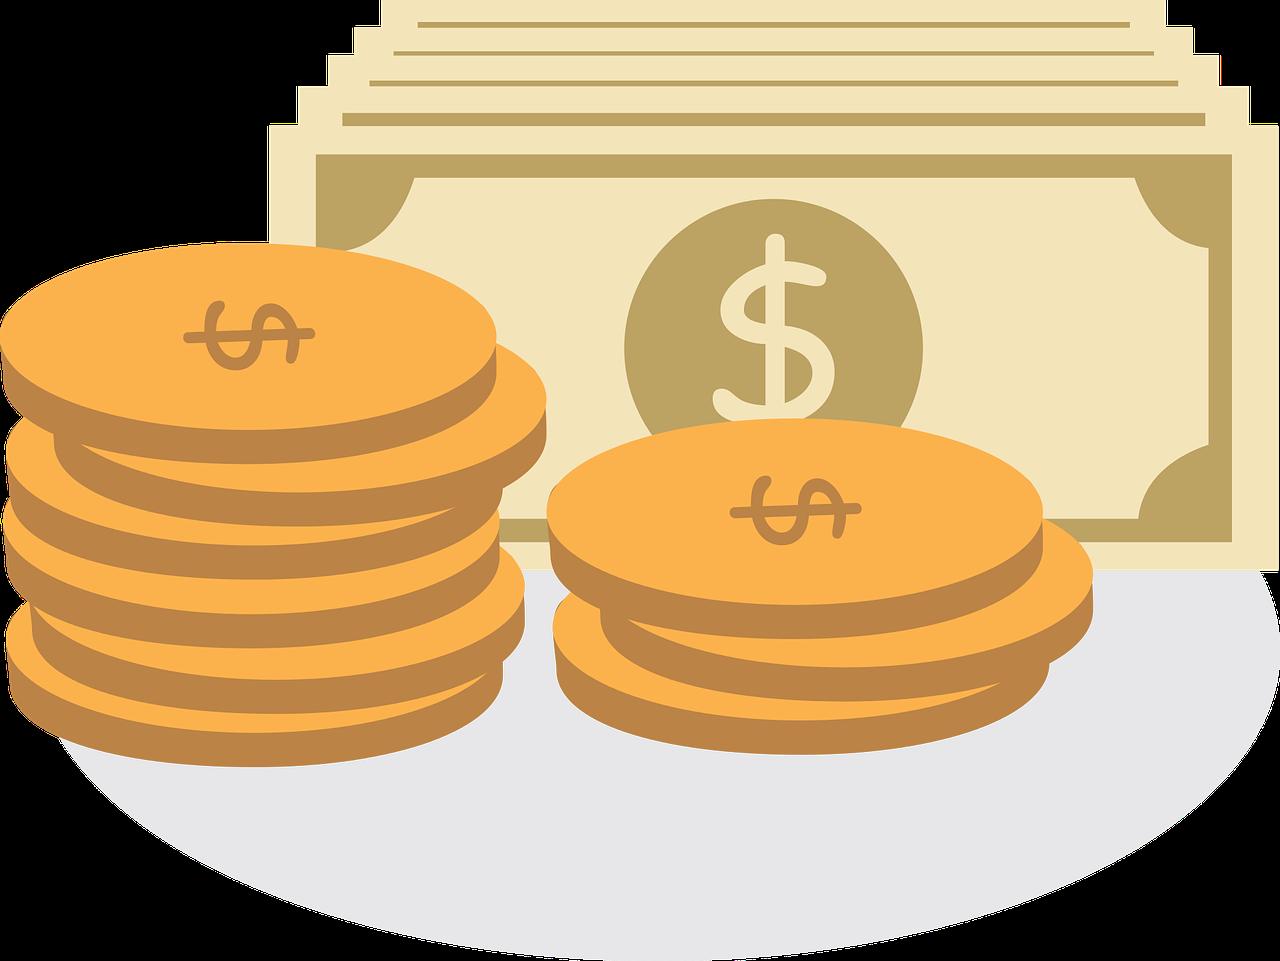 money お金 コイン 費用 広告 広告費 コスト ビットコイン 仮想通貨